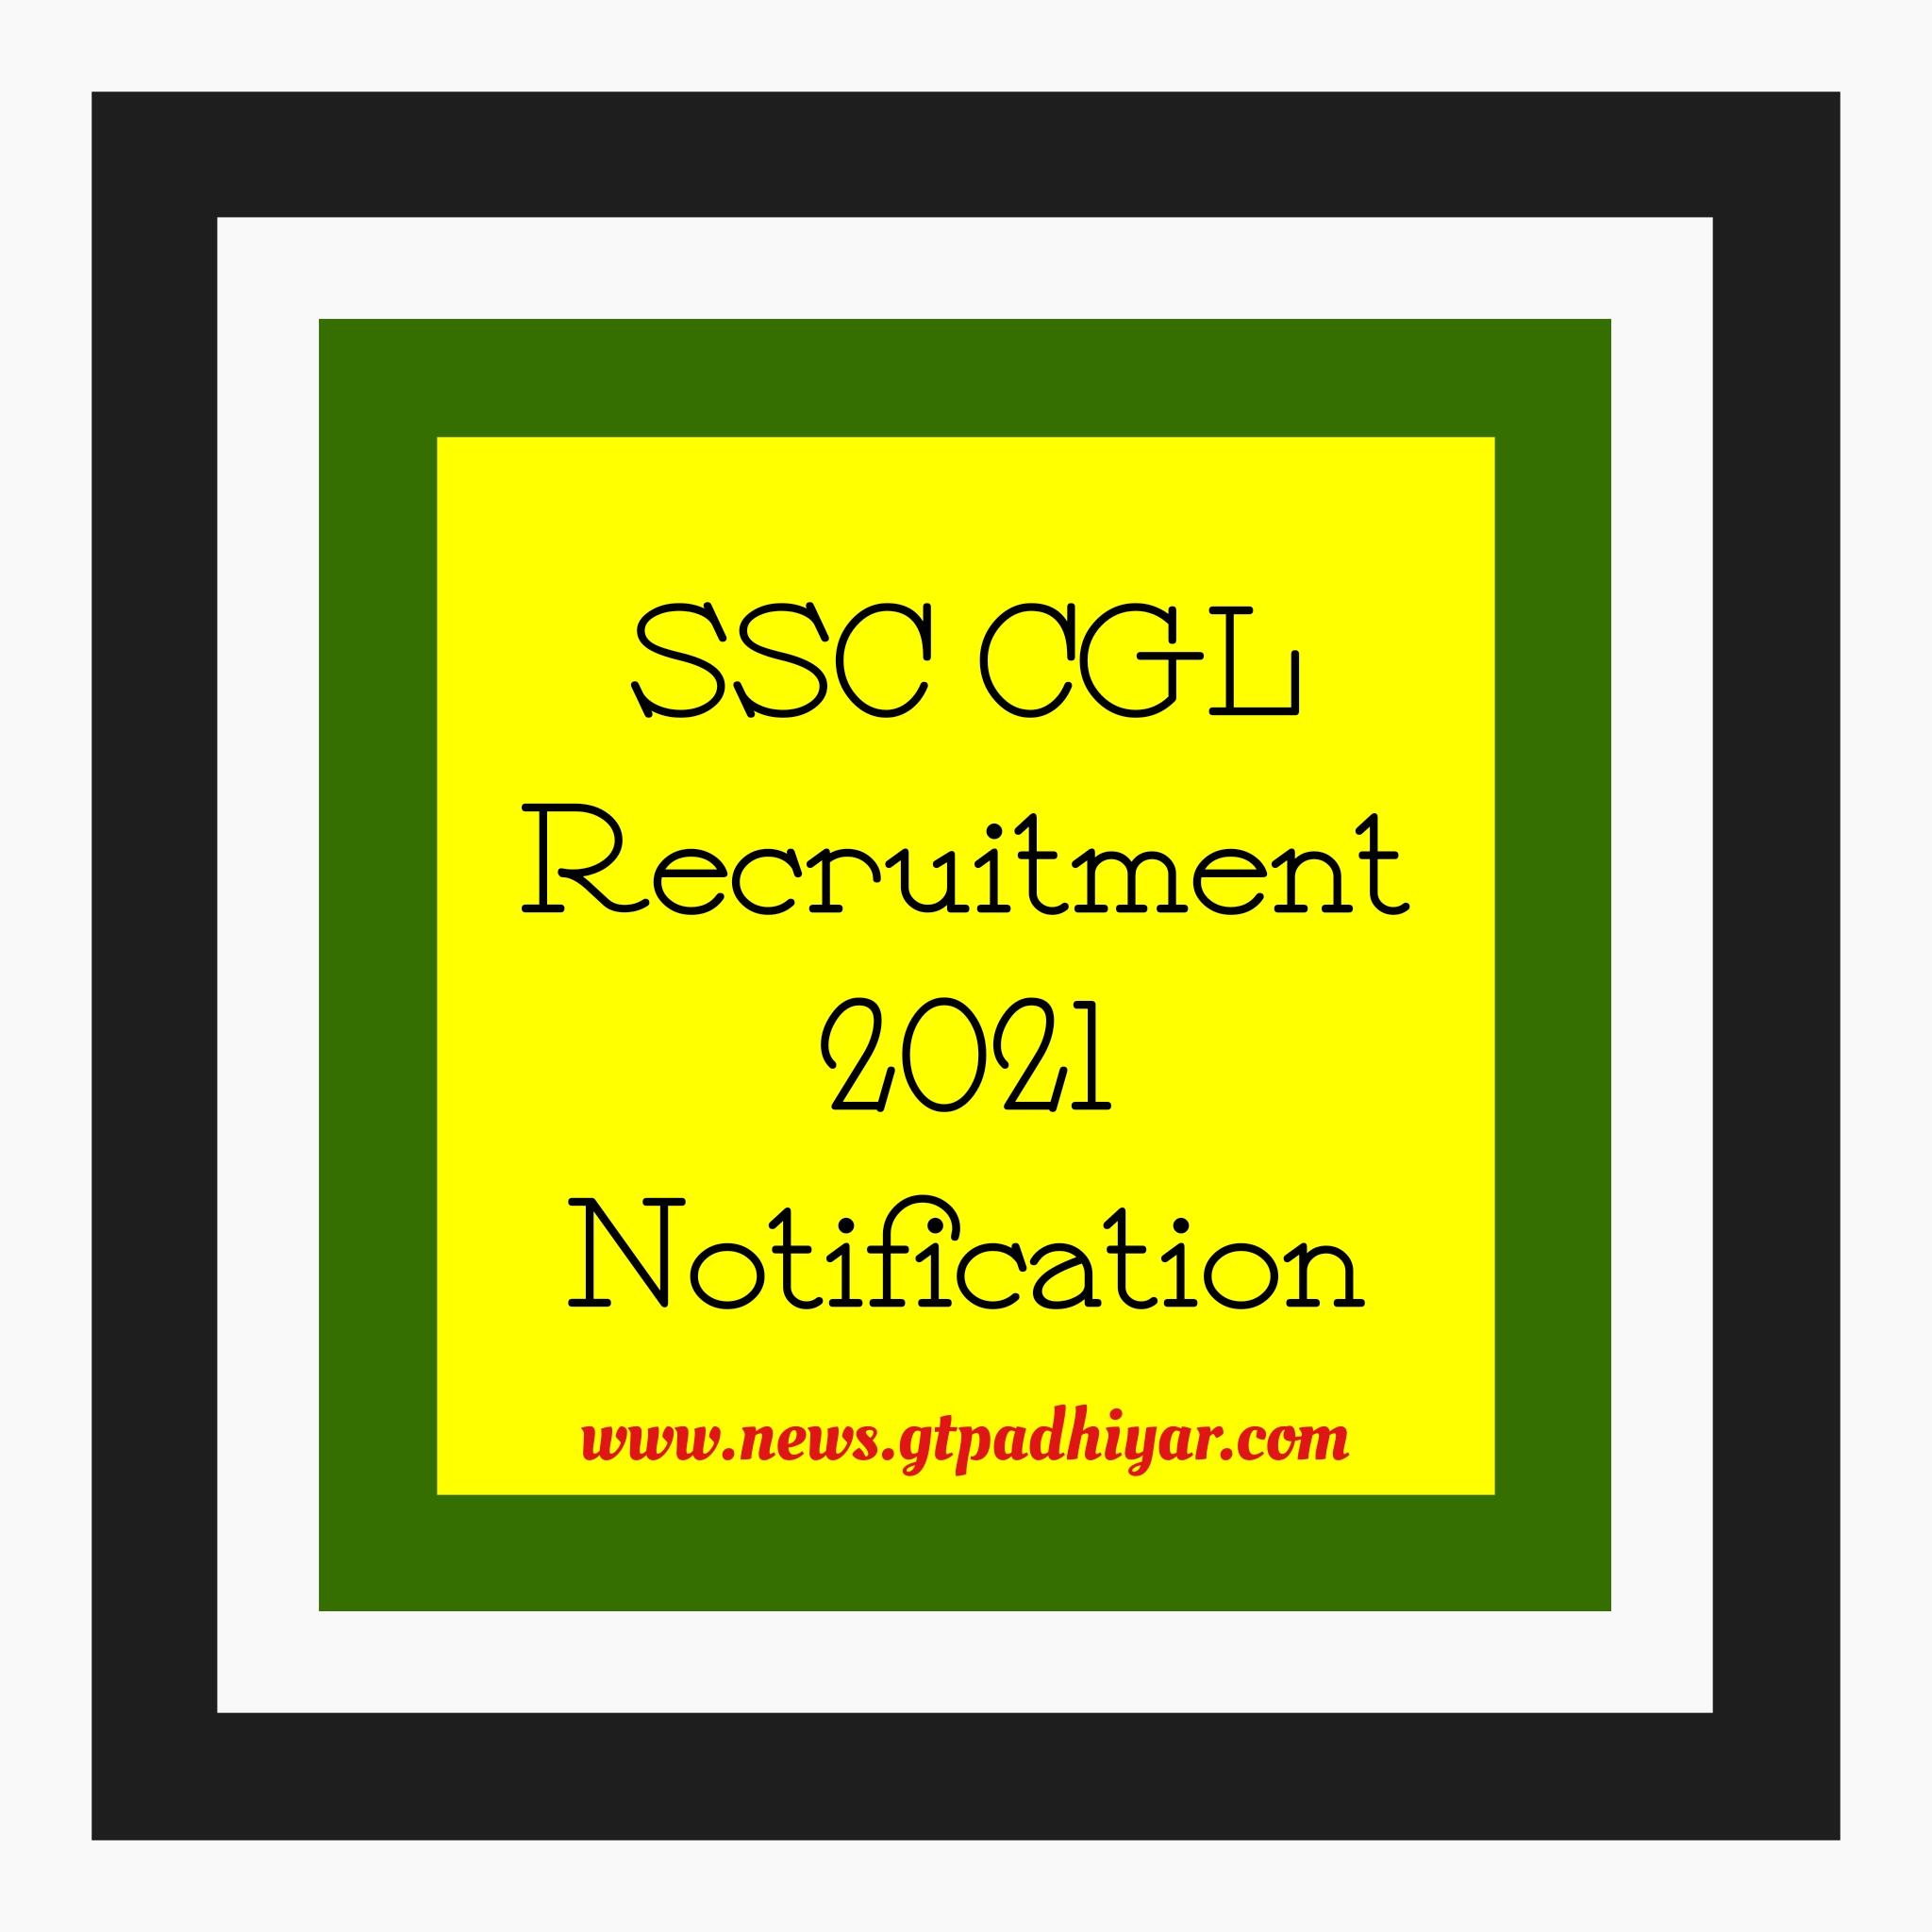 SSC CGL Recruitment 2021 Notification